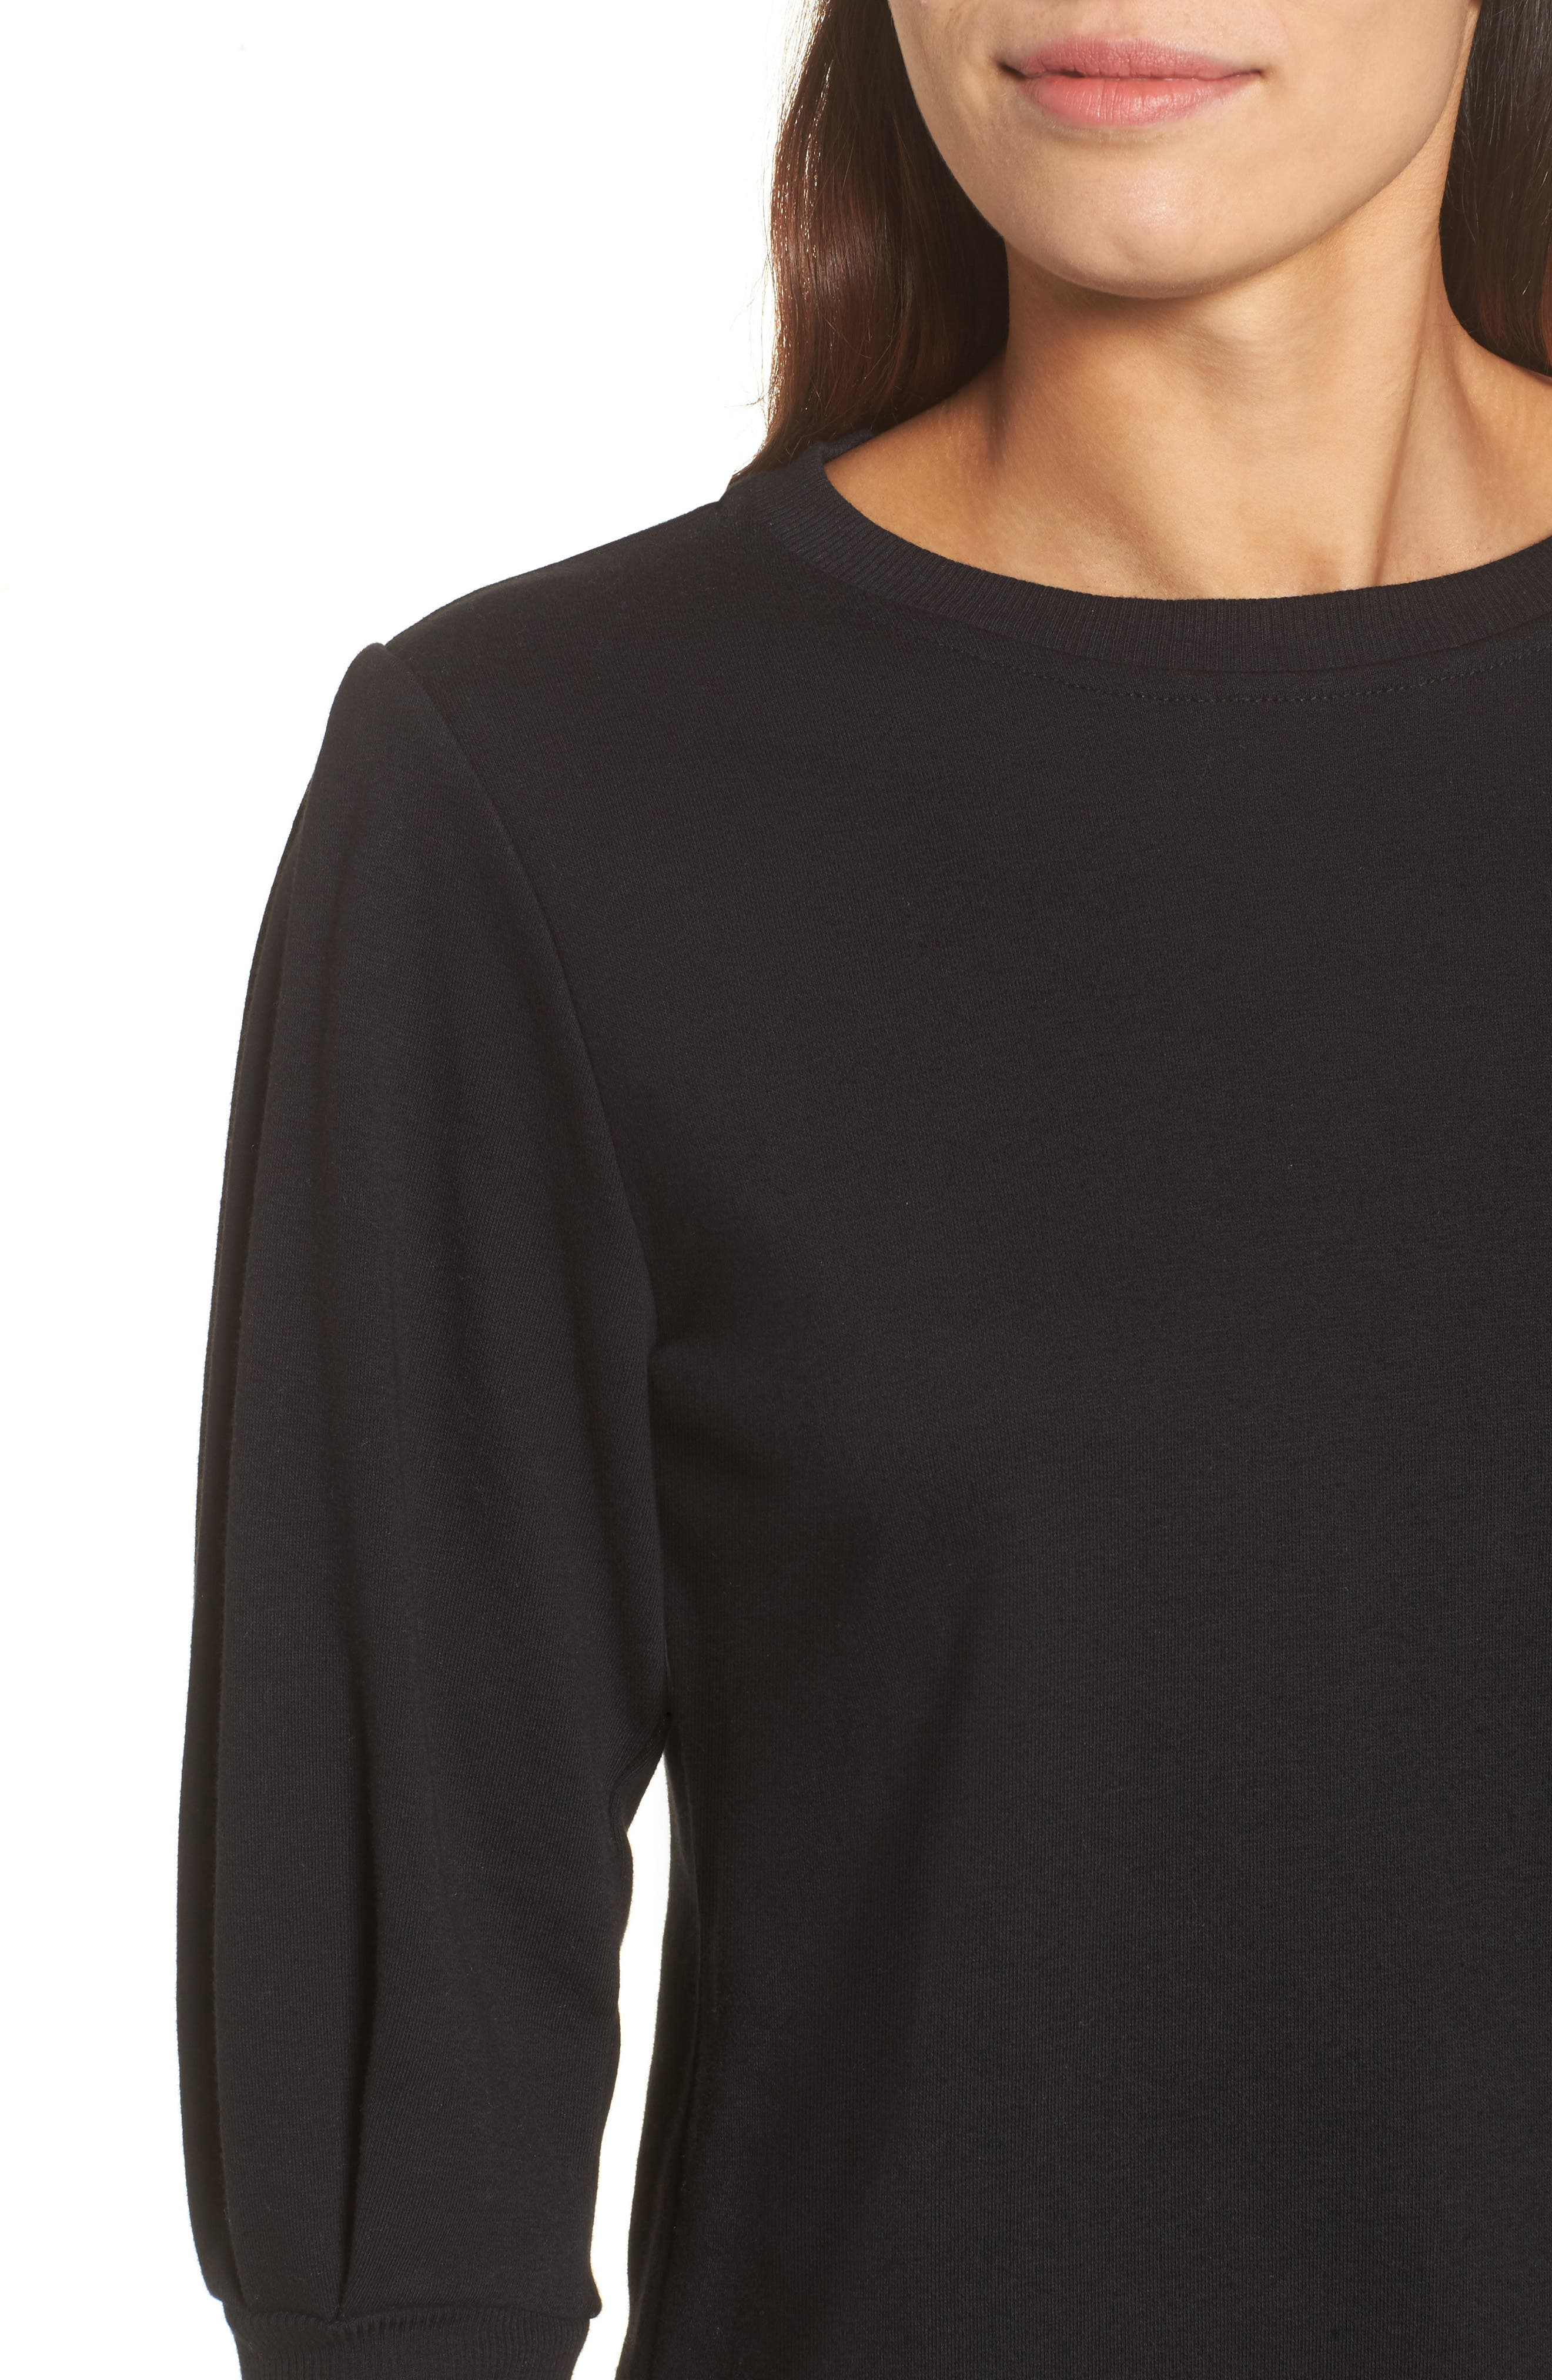 Blouson Sleeve Sweatshirt,                             Alternate thumbnail 16, color,